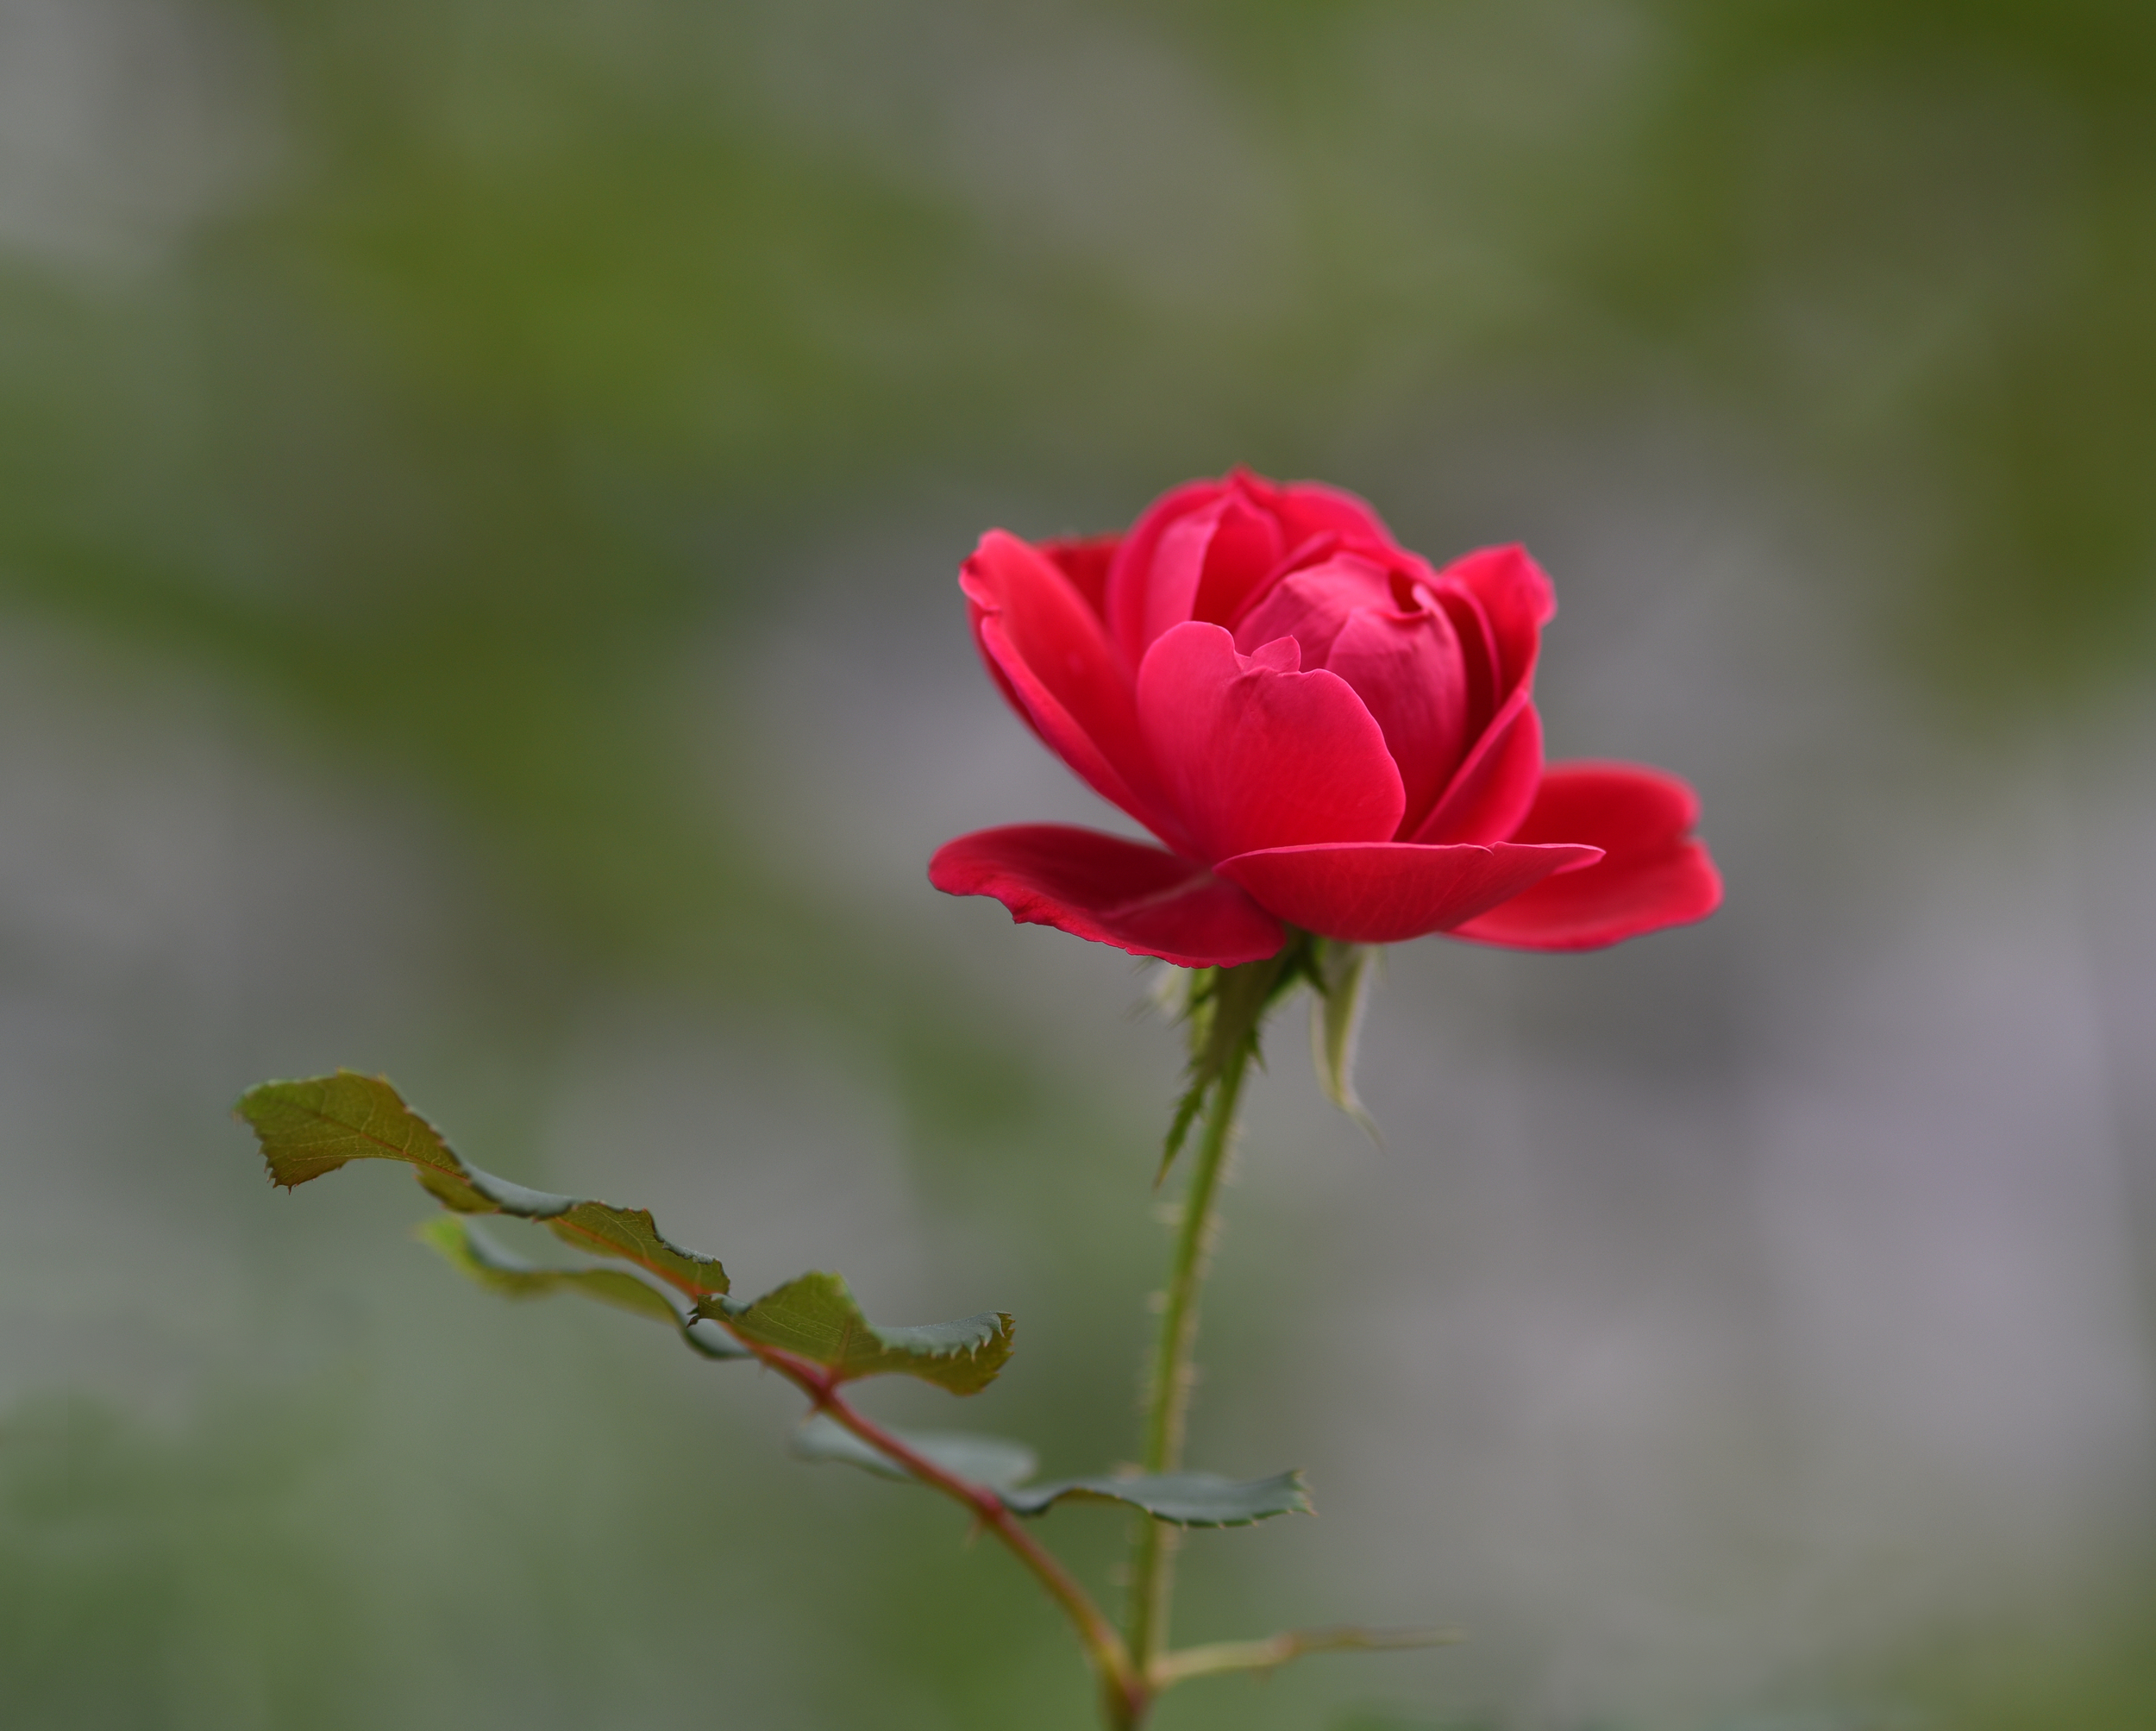 rose_6557.jpg